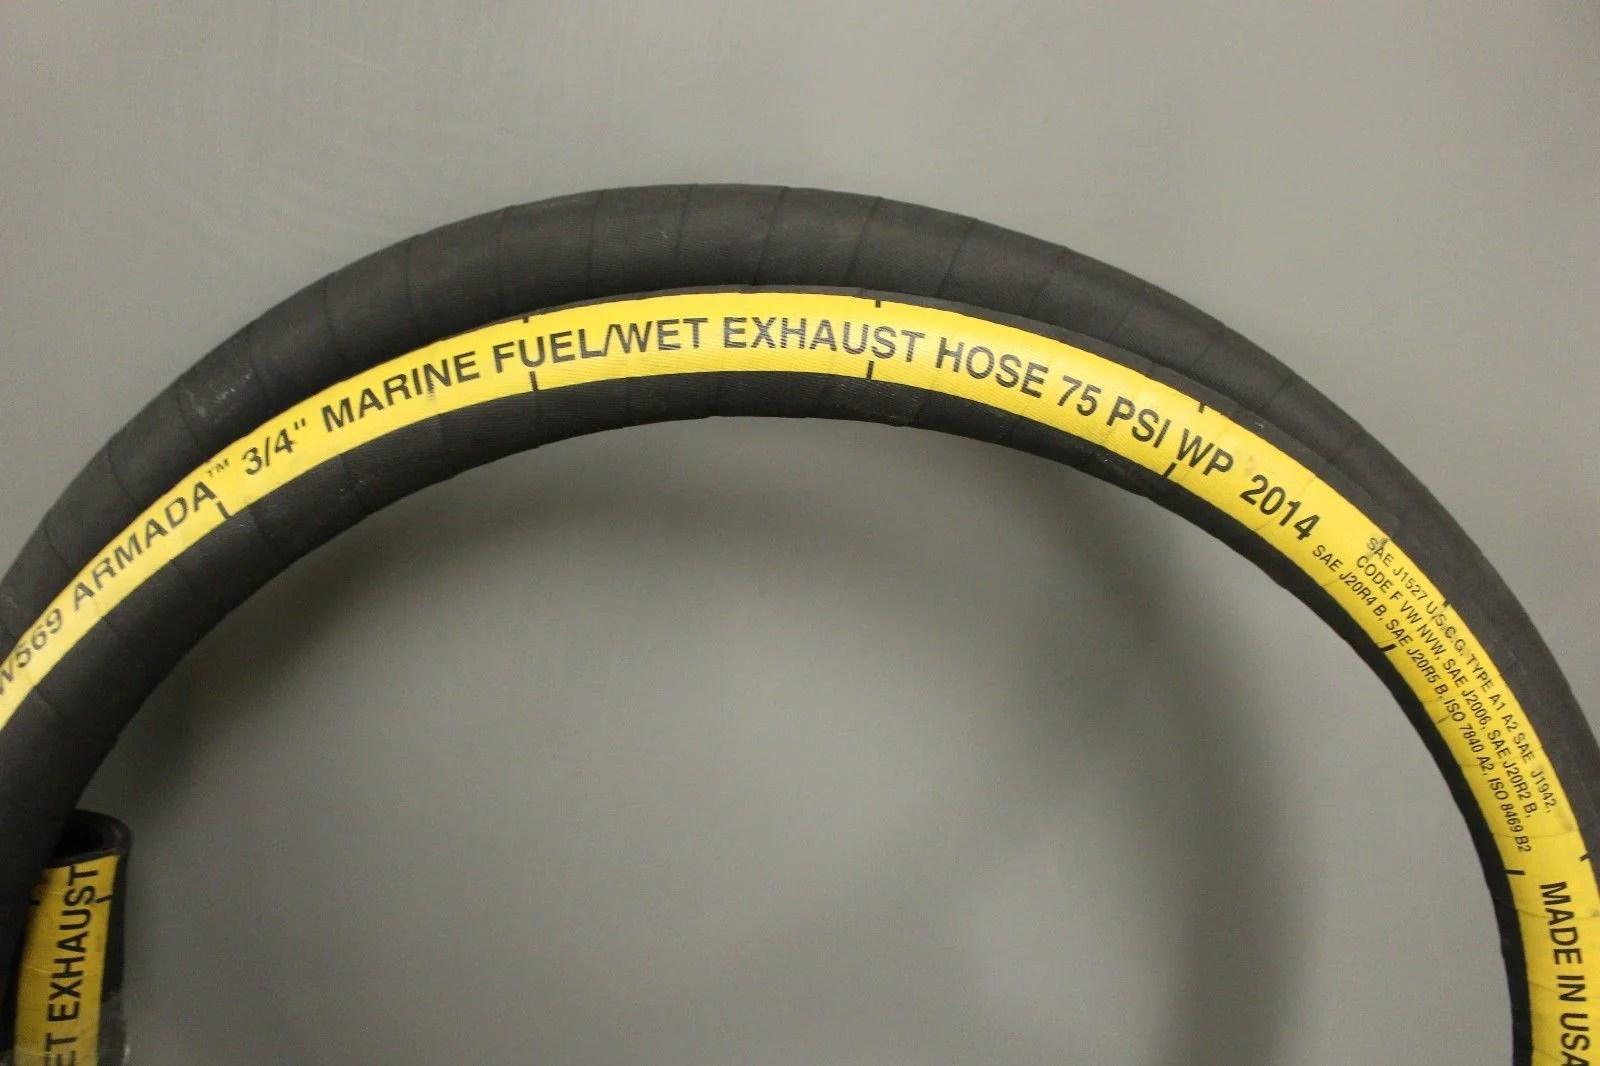 parker sw569 750 marine fuel wet exhaust hose 11 roll